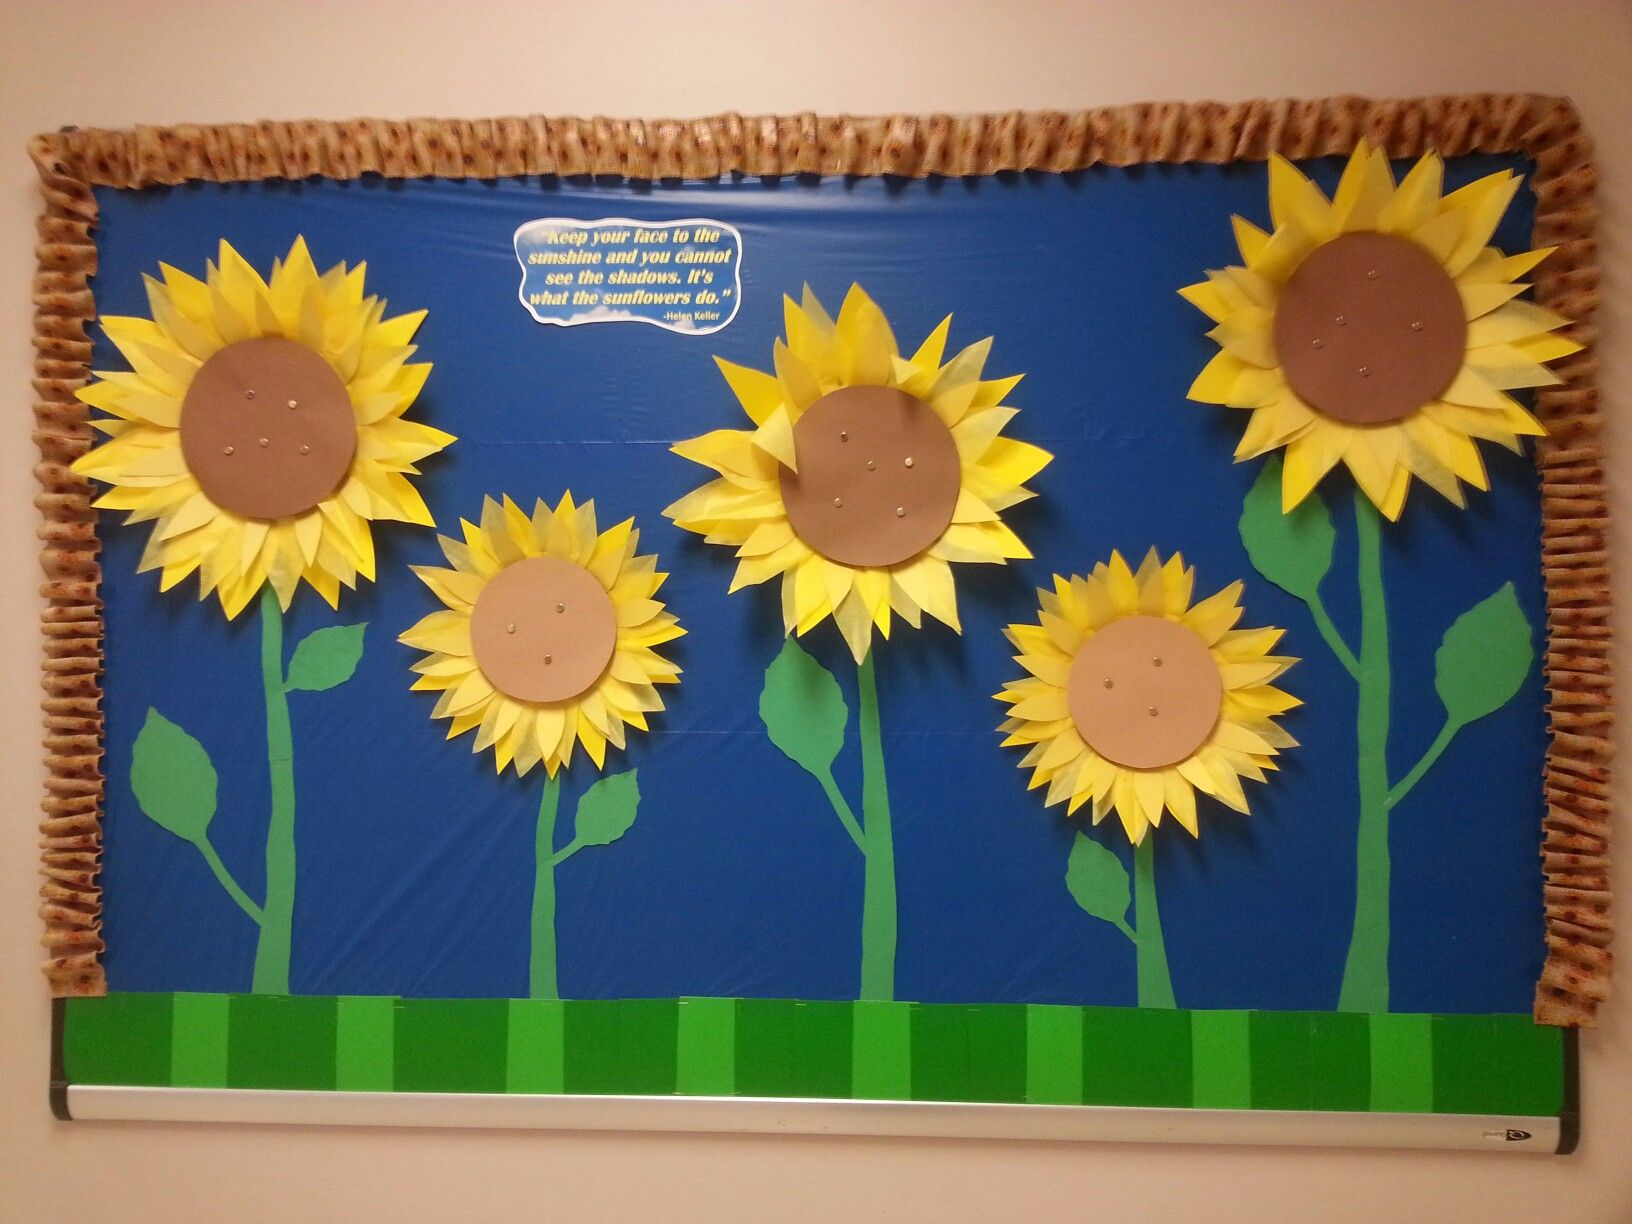 Sunflower Bulletin Board With Helen Keller Quote